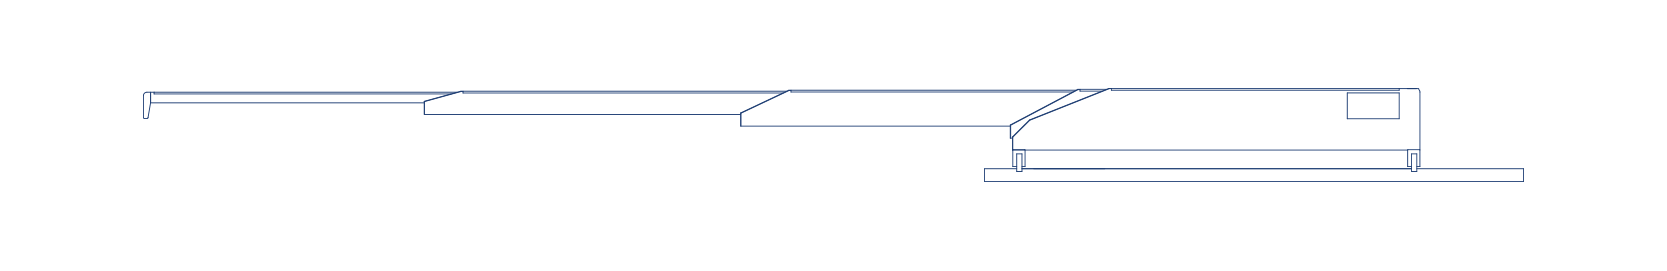 traversing options for MTC conveyor